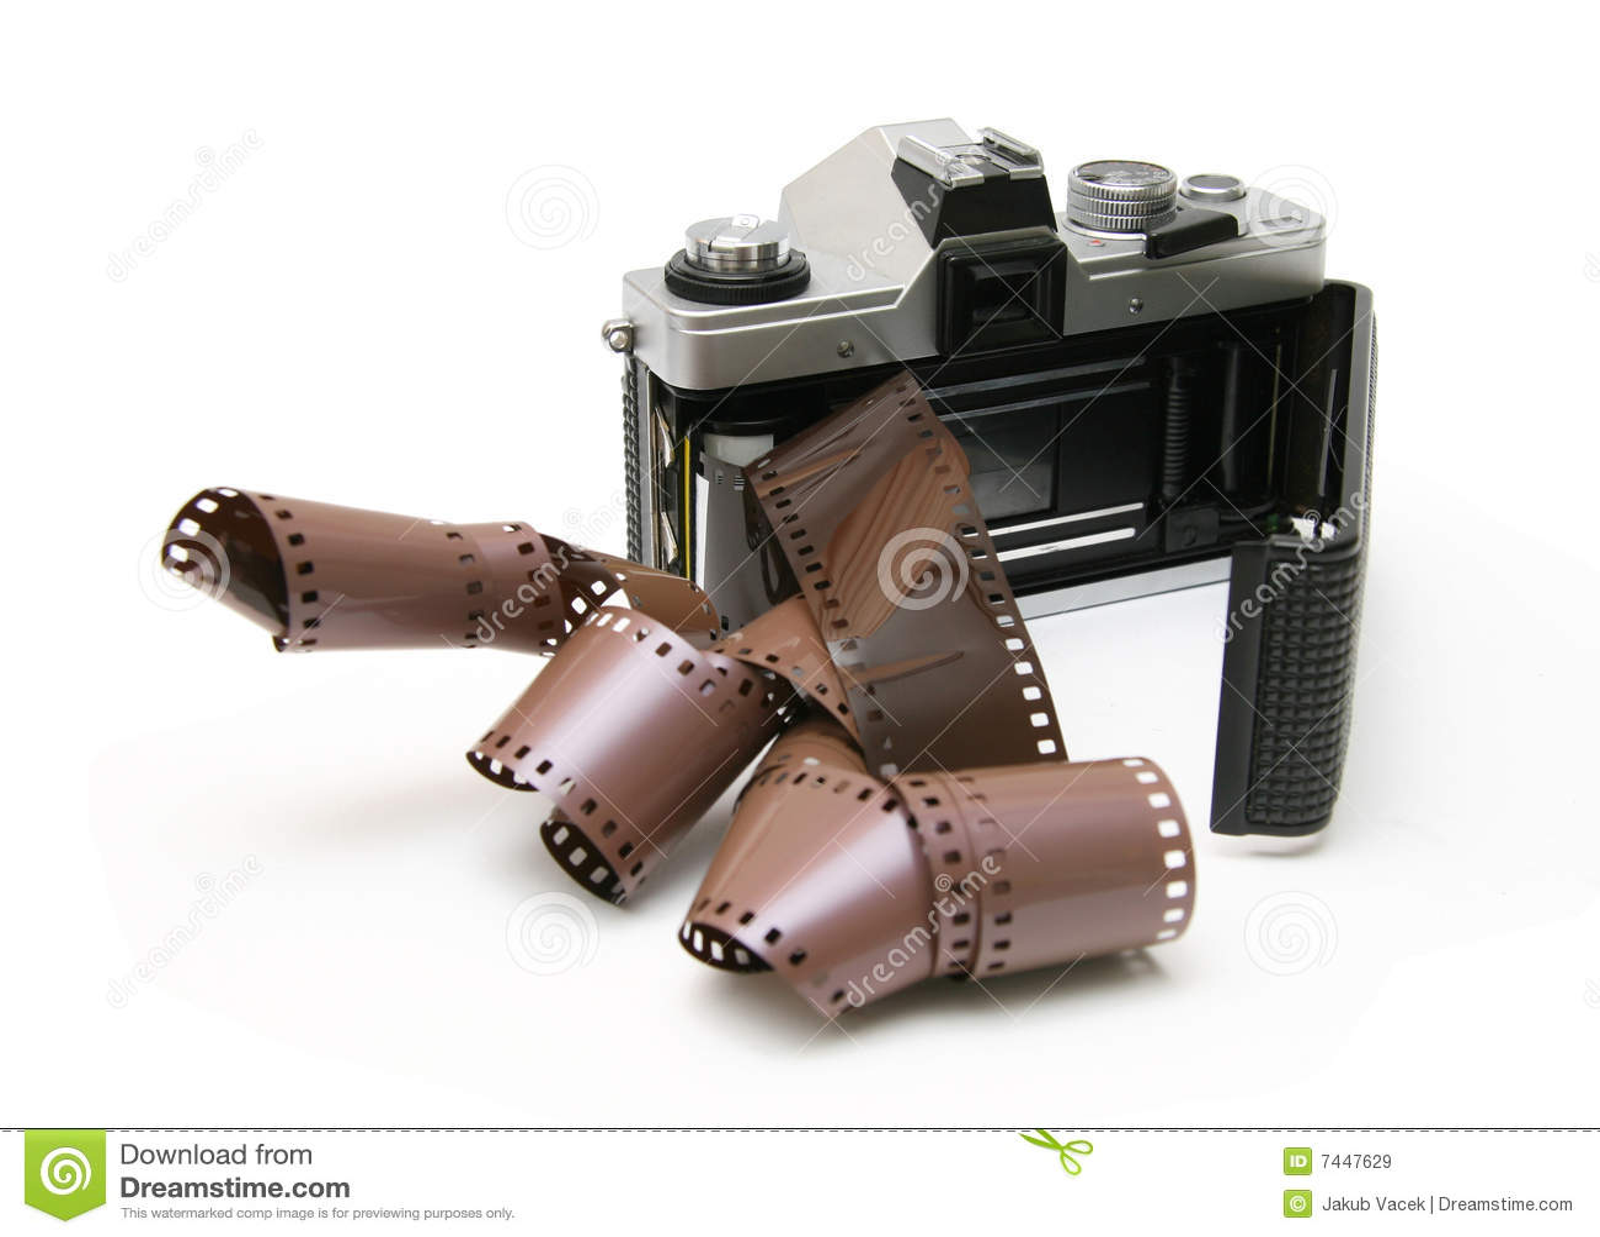 Vintage Movie & Photography, Cameras & Photo